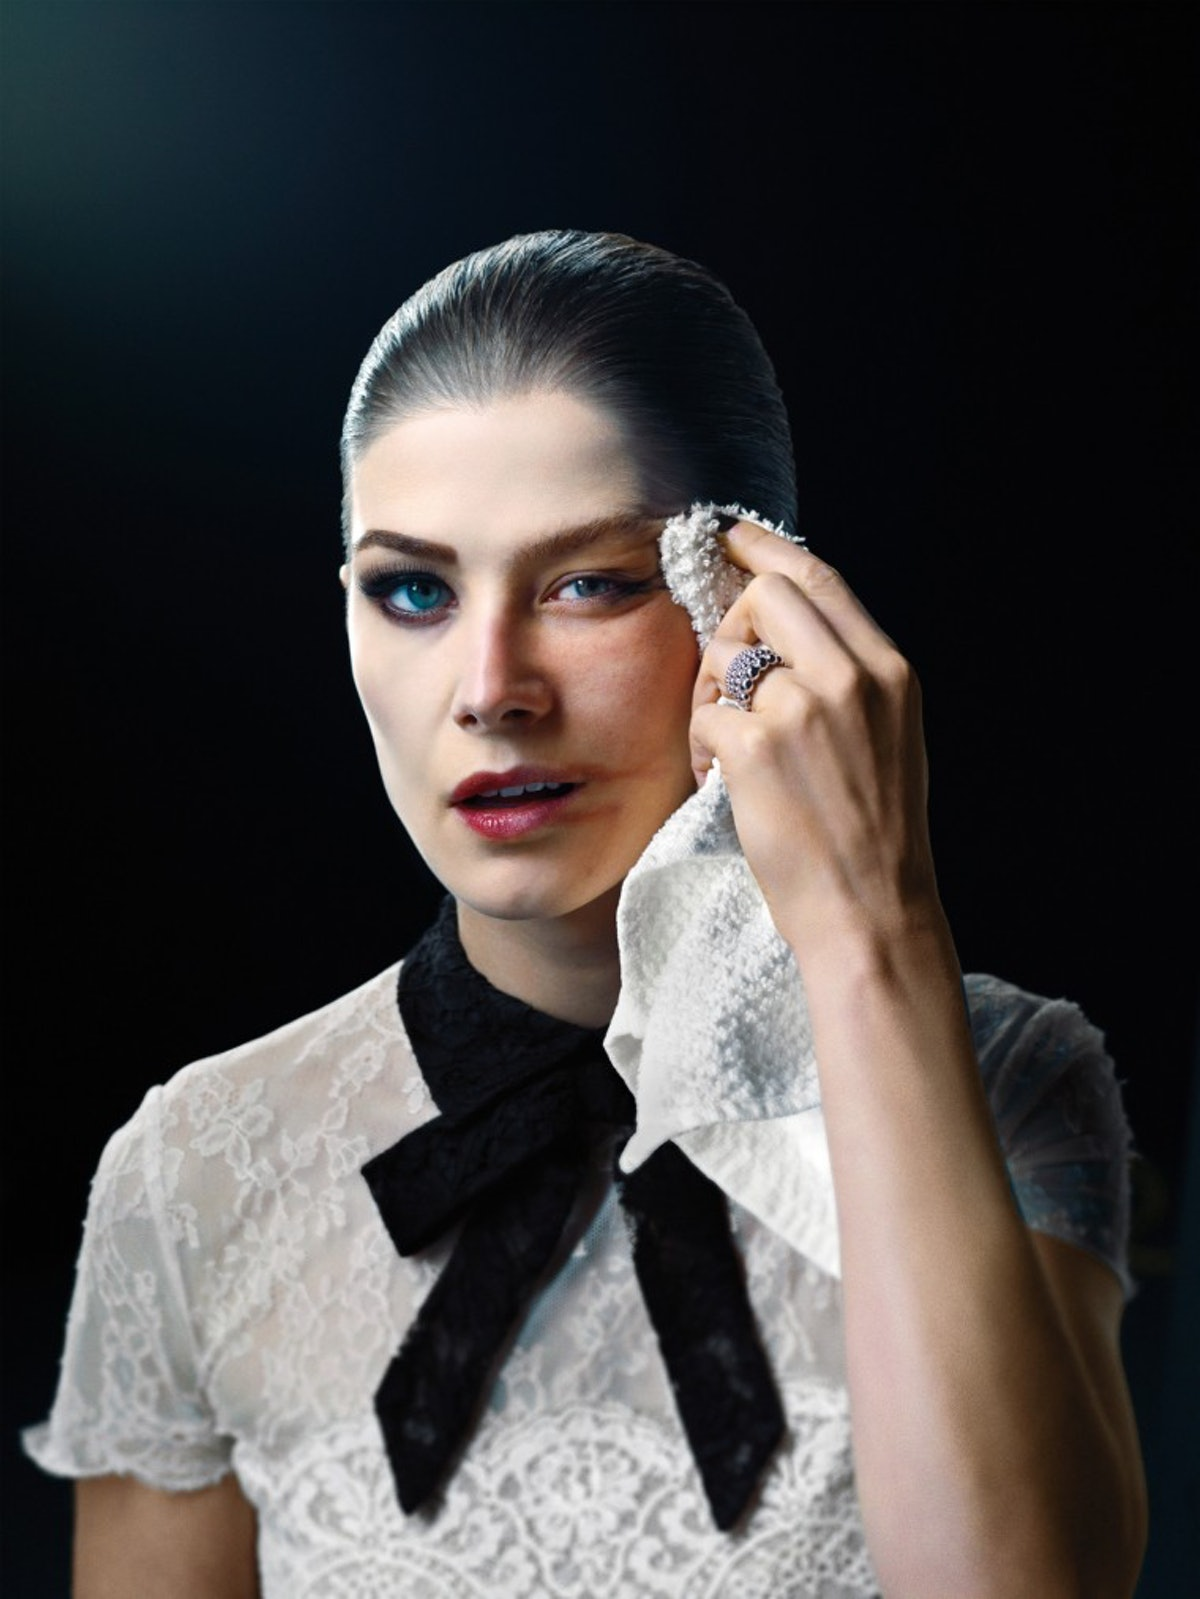 rosamund-pike-makeup-portrait-760x1013